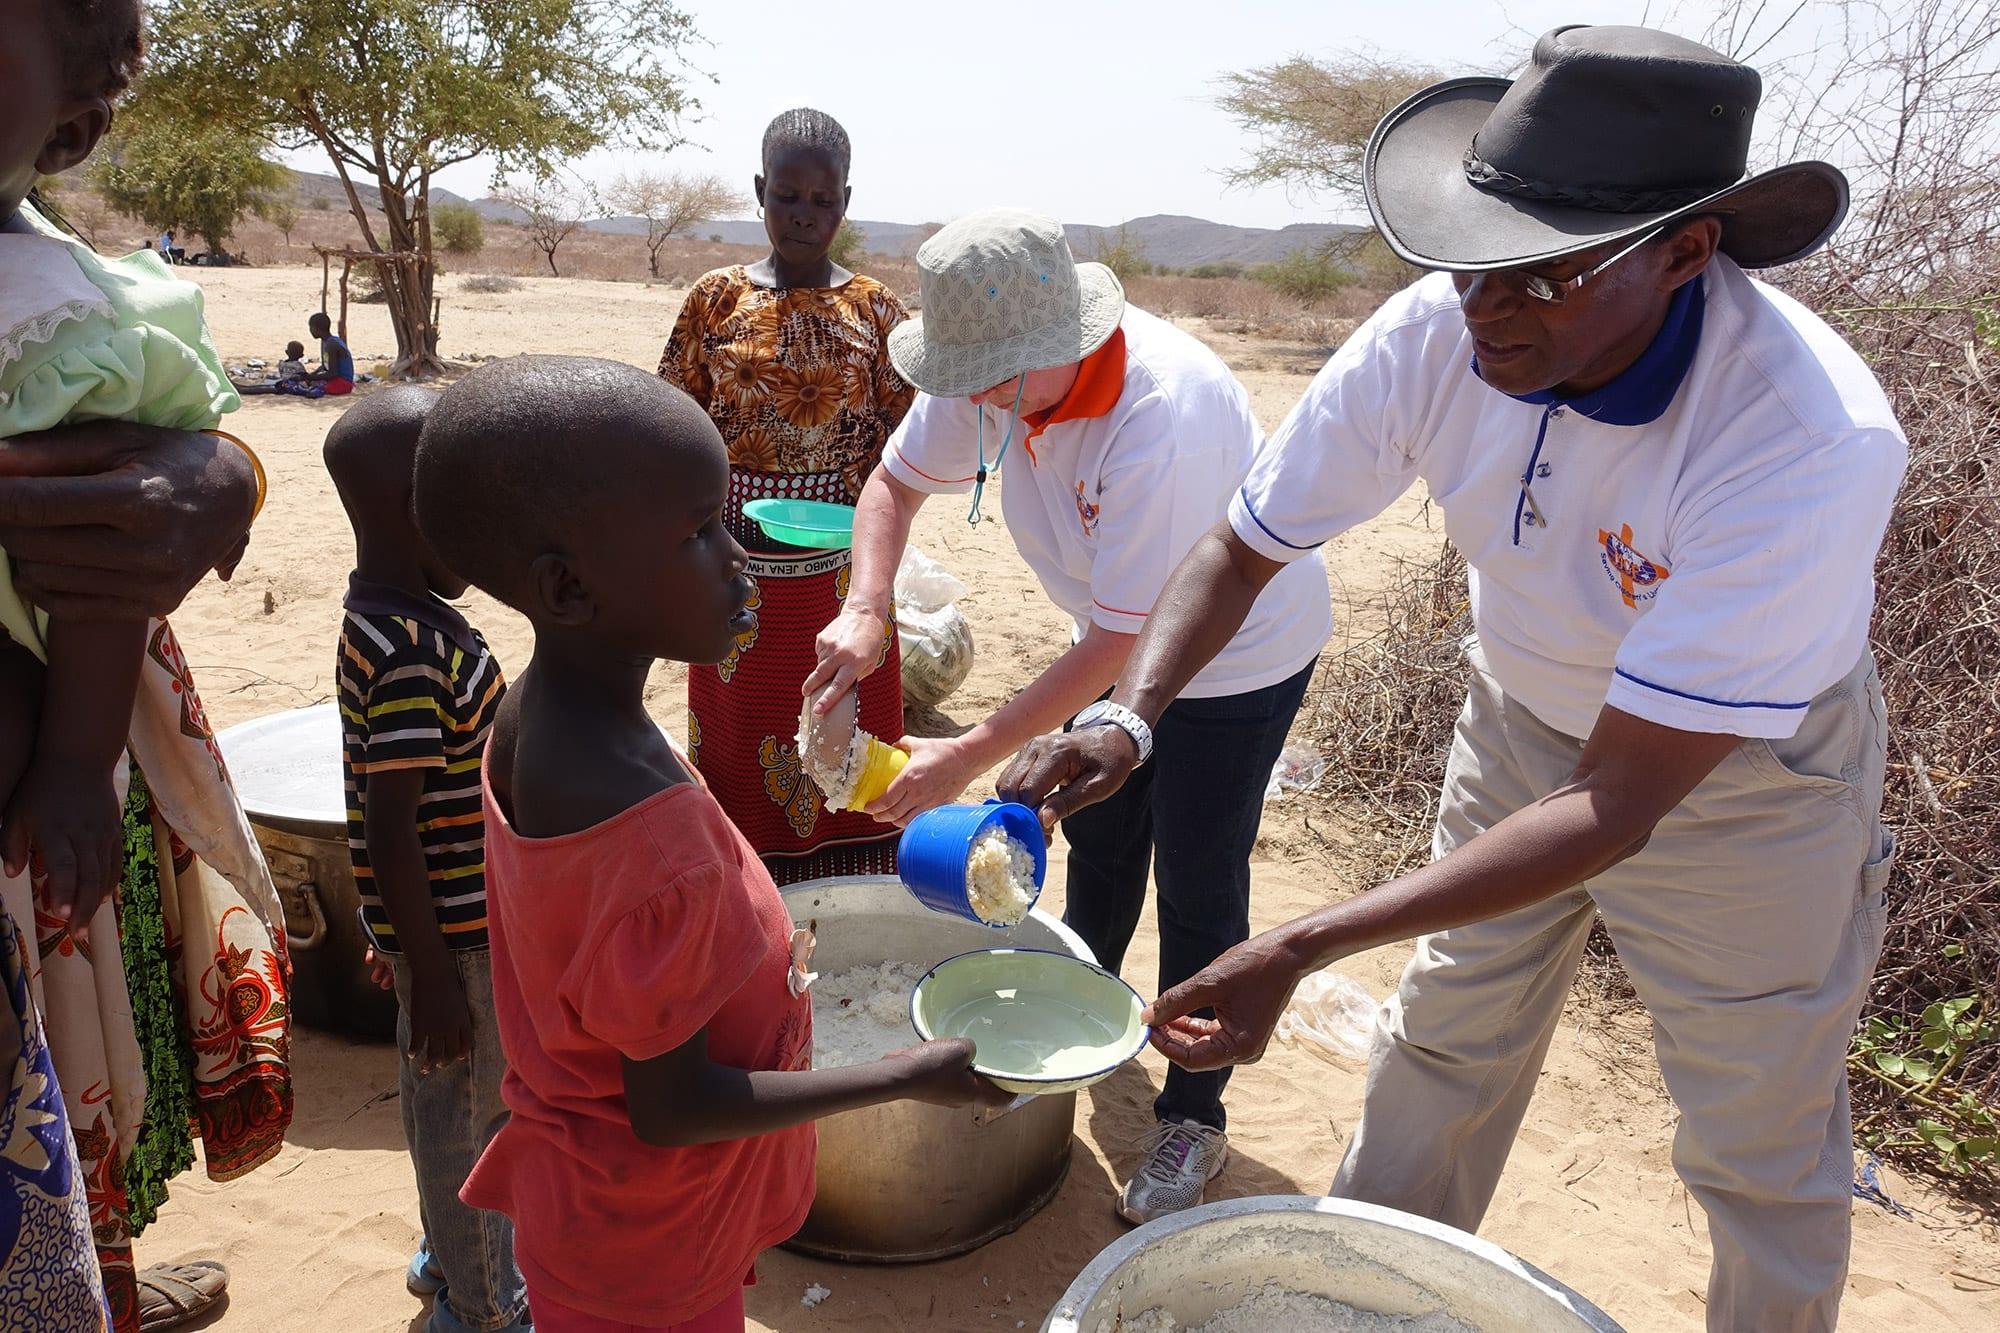 Charles Mulli serving food to children